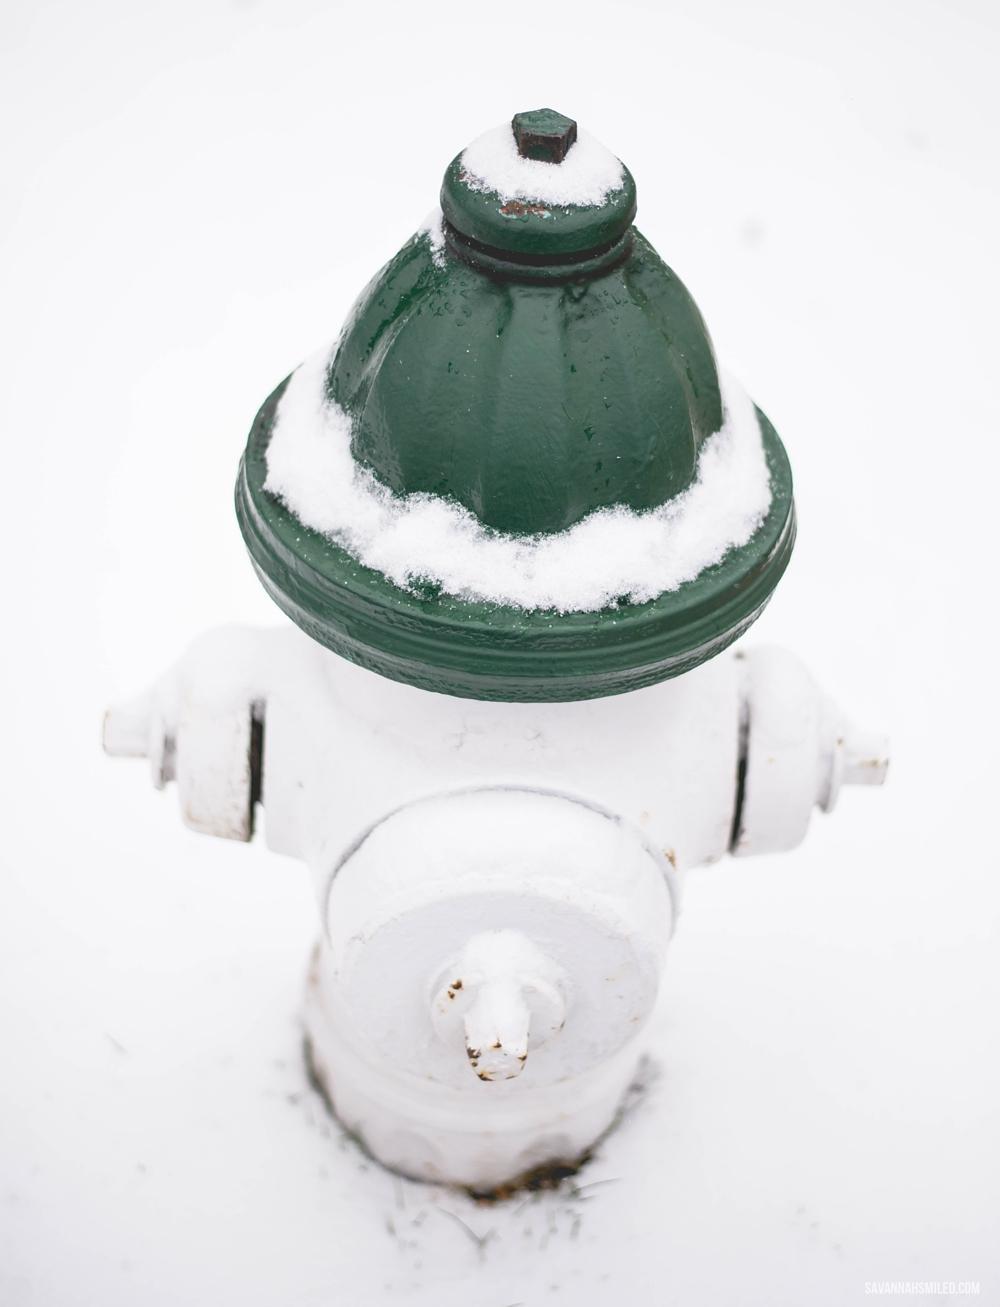 snow-day-dallas-weather-9.jpg